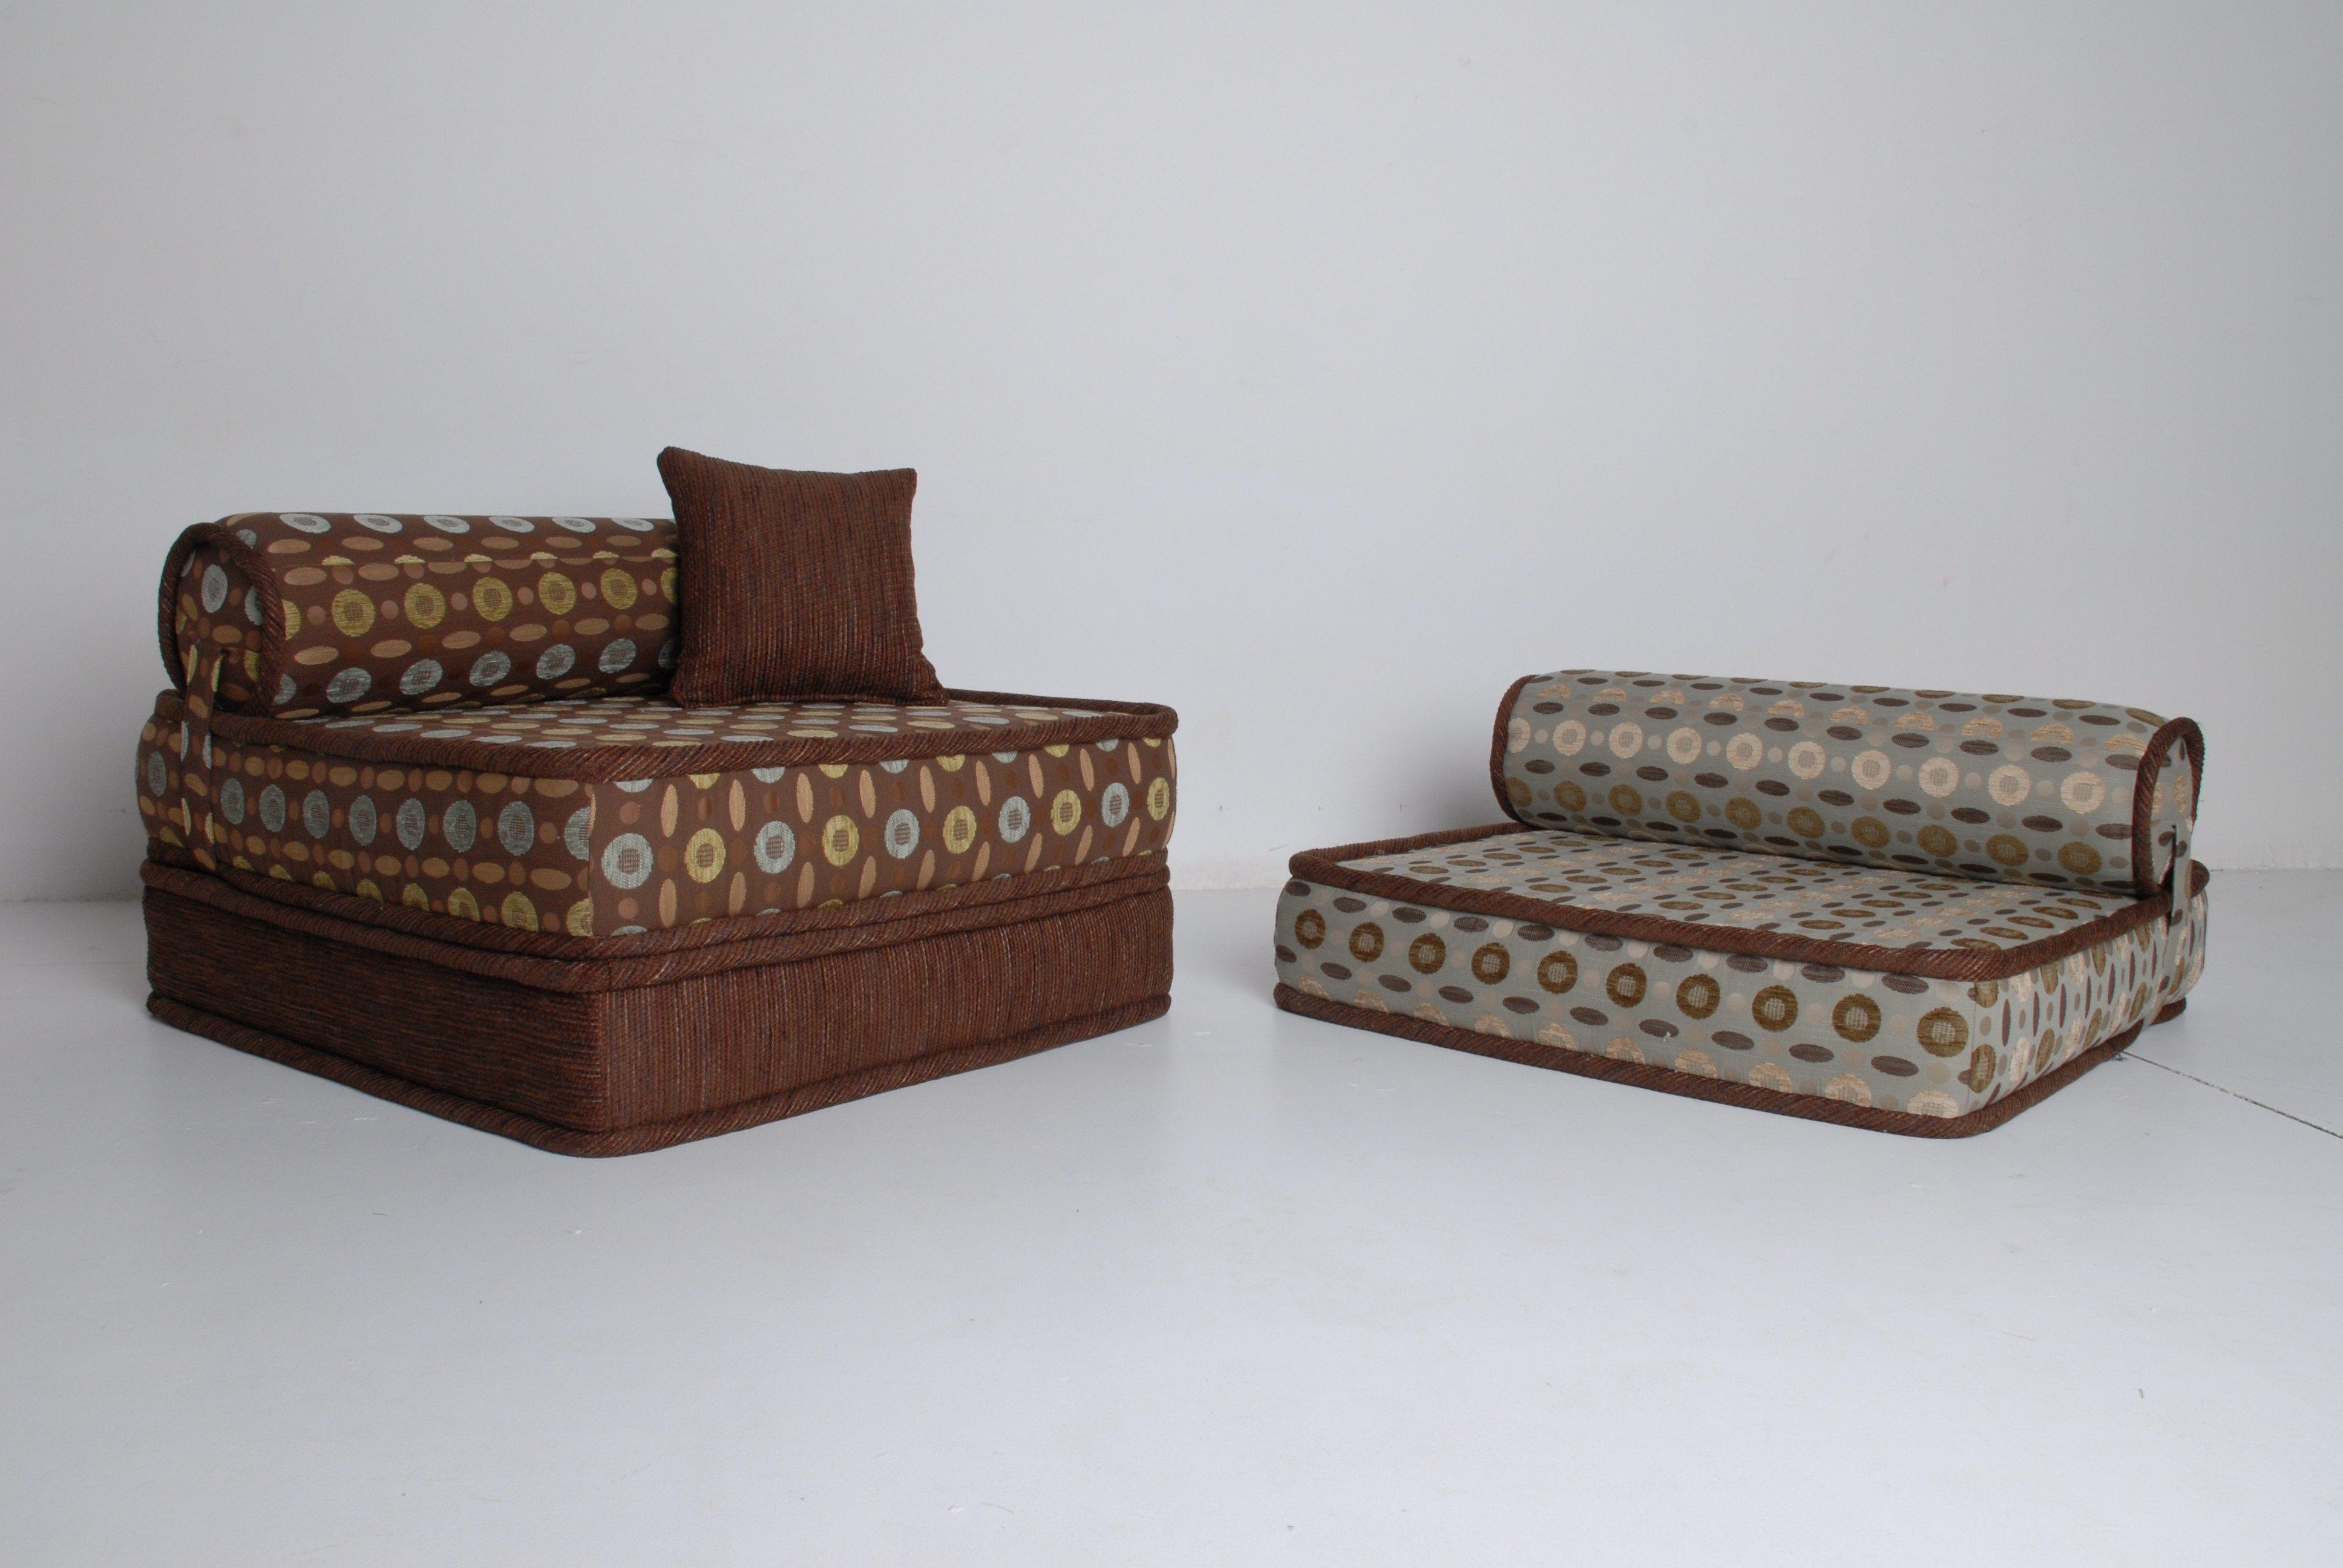 Style Clical Multicoloured Sofa Matres Uder The Head